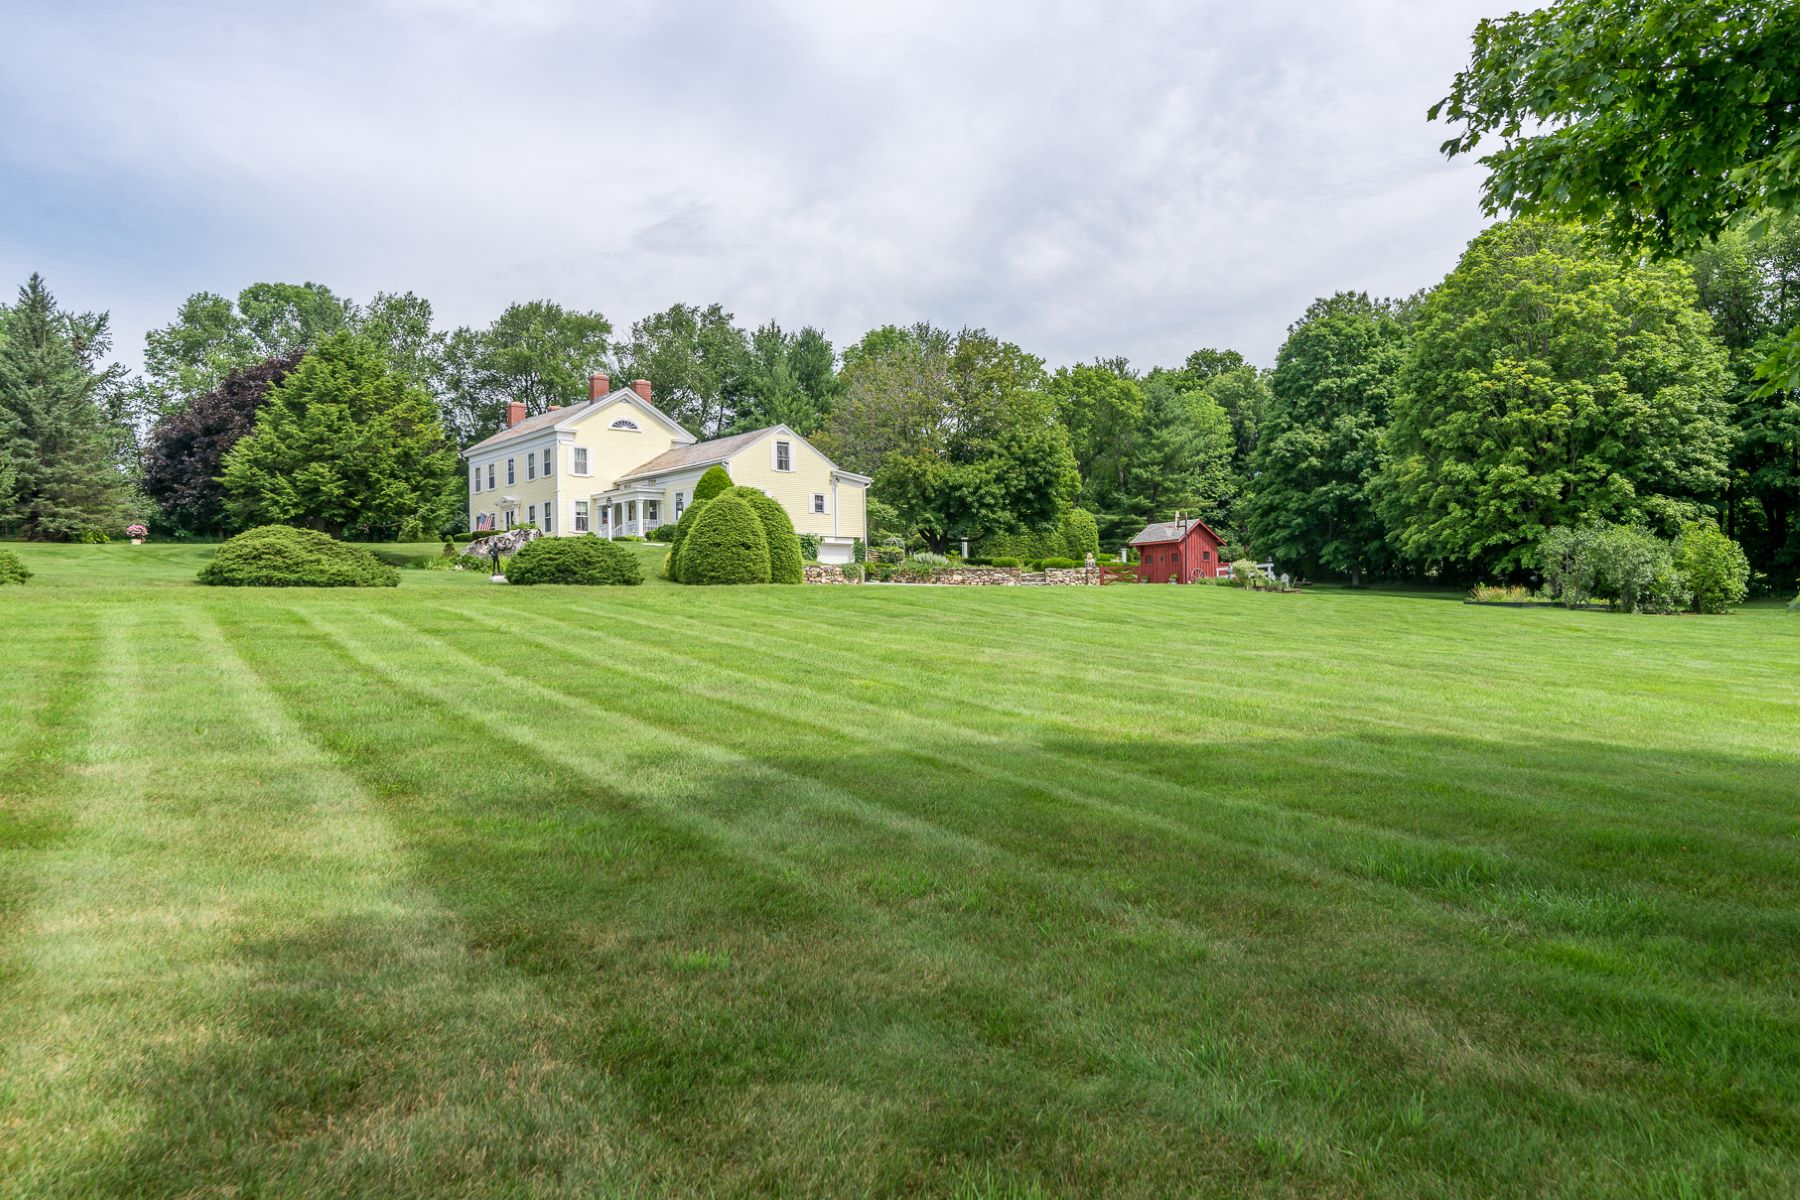 single family homes for Sale at The Landmark 164 Landmark Ln Manchester, Vermont 05255 United States